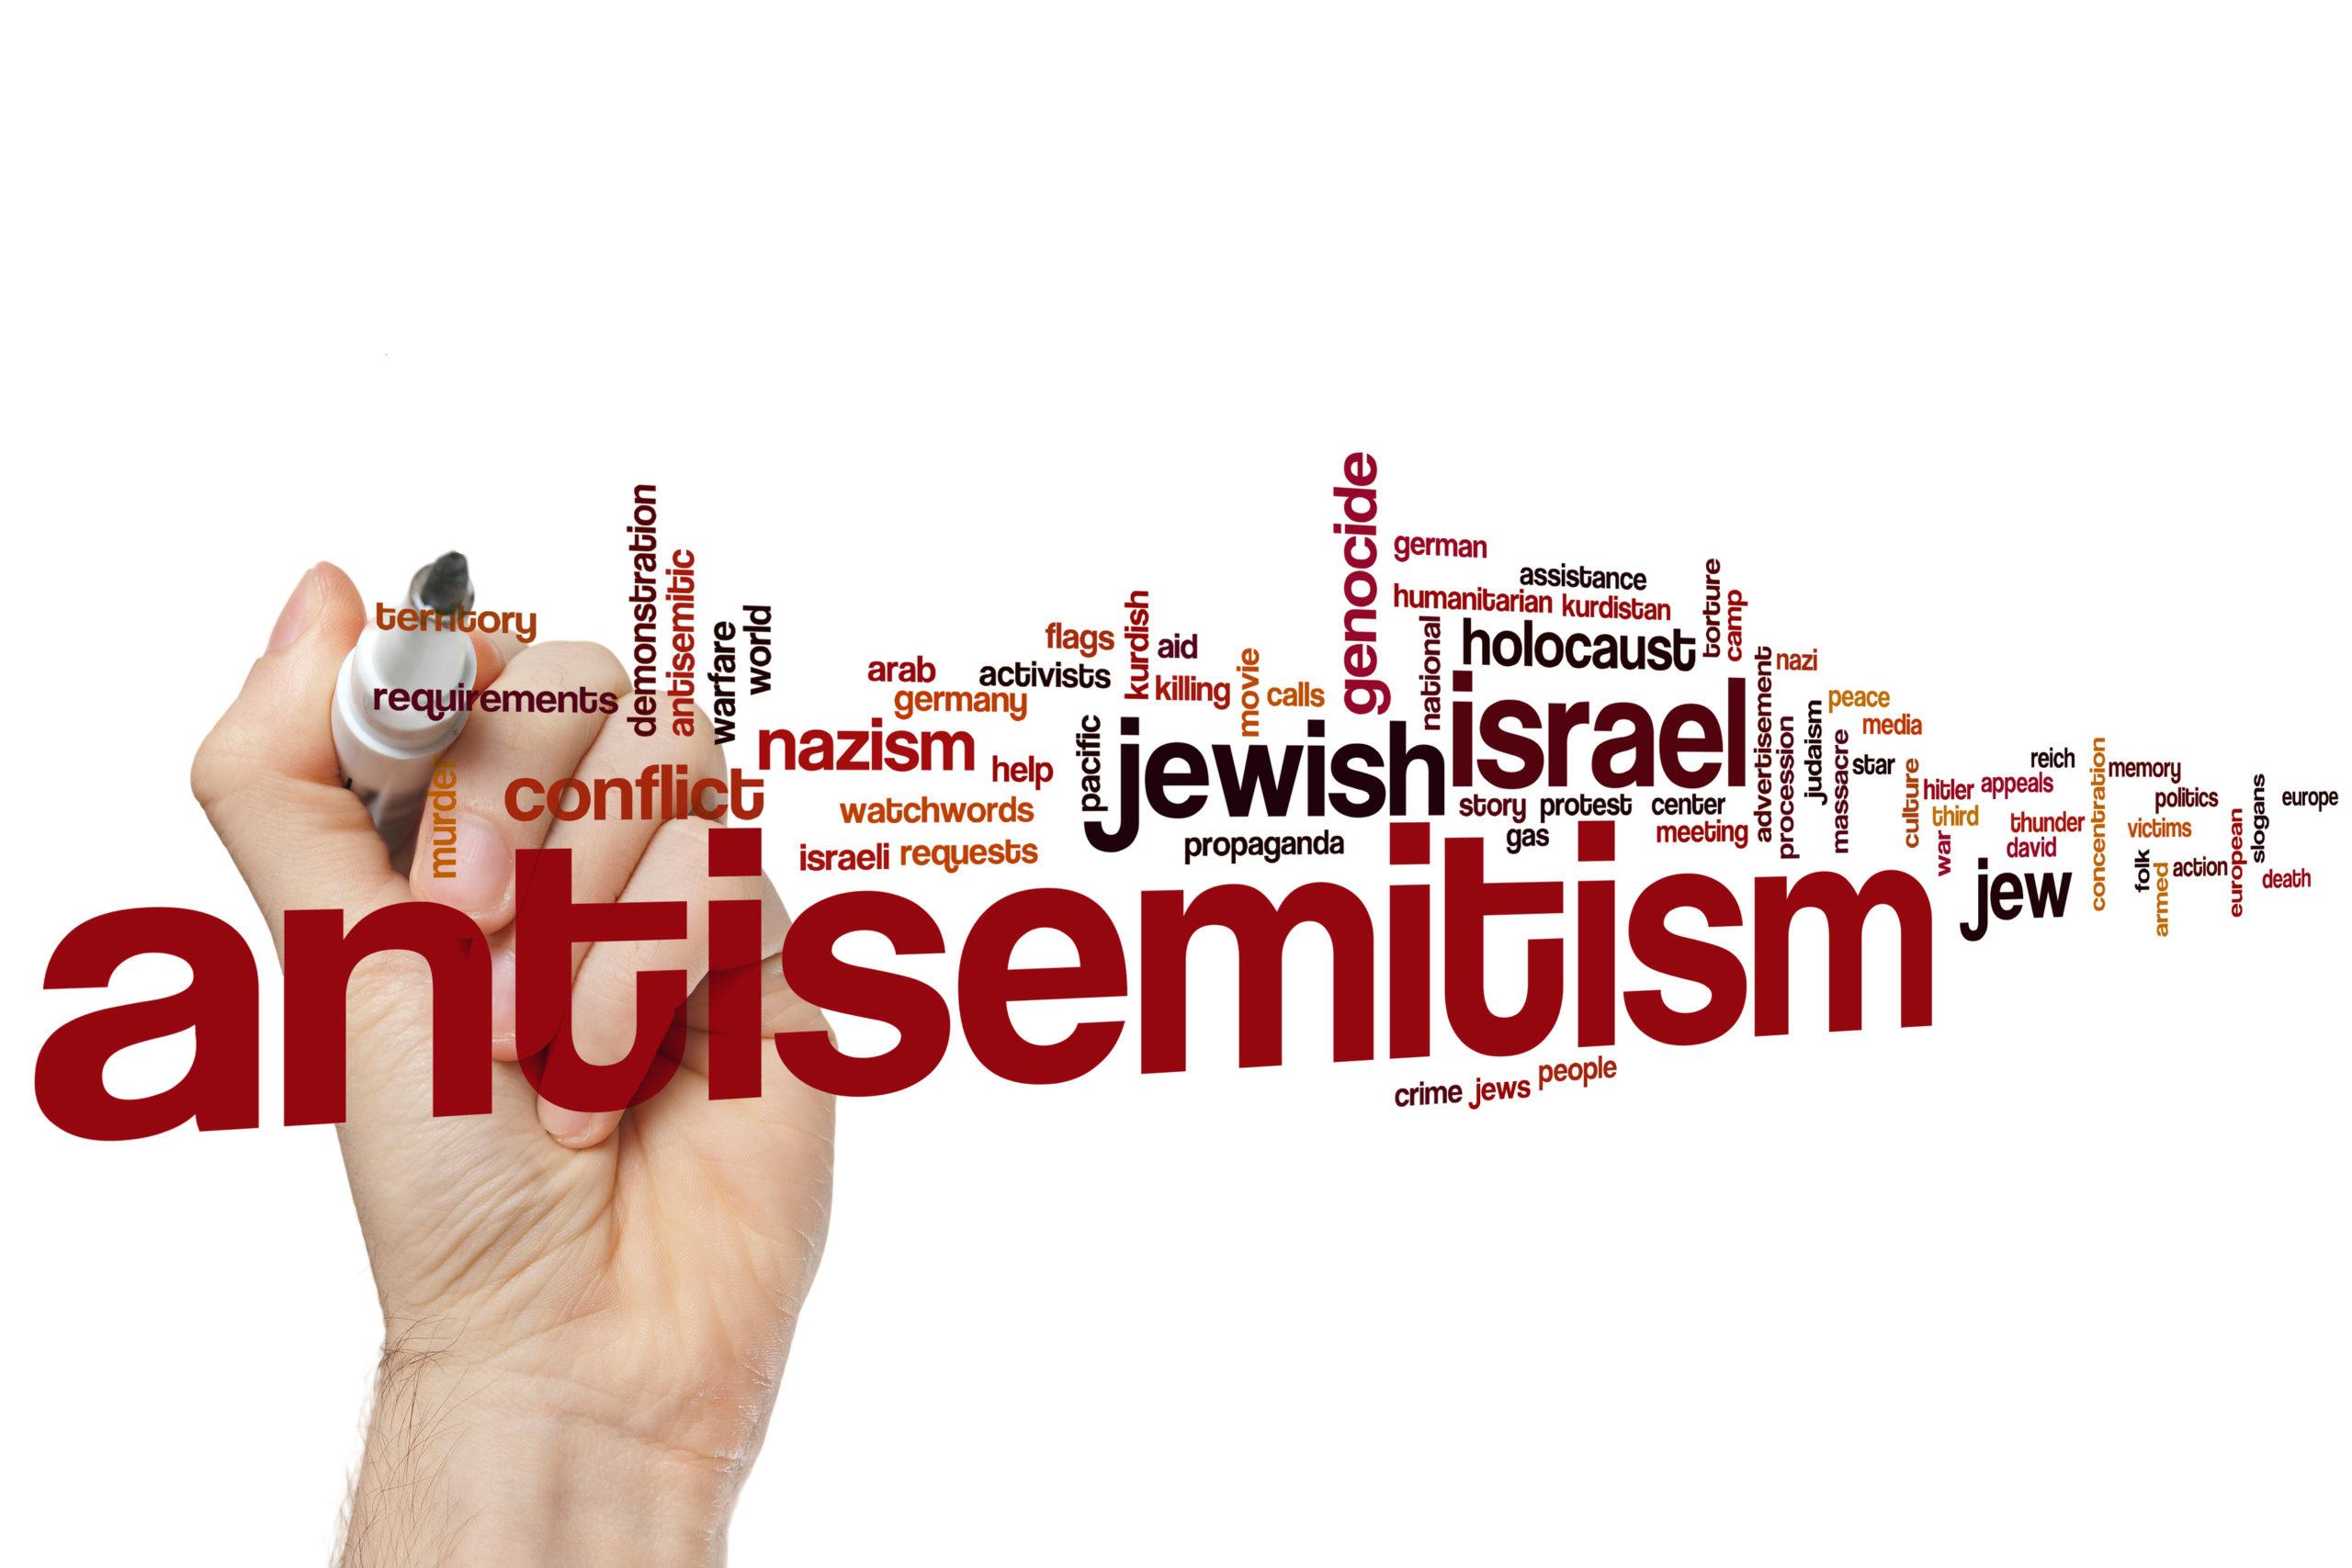 Antisemitic discourse in Western Balkans